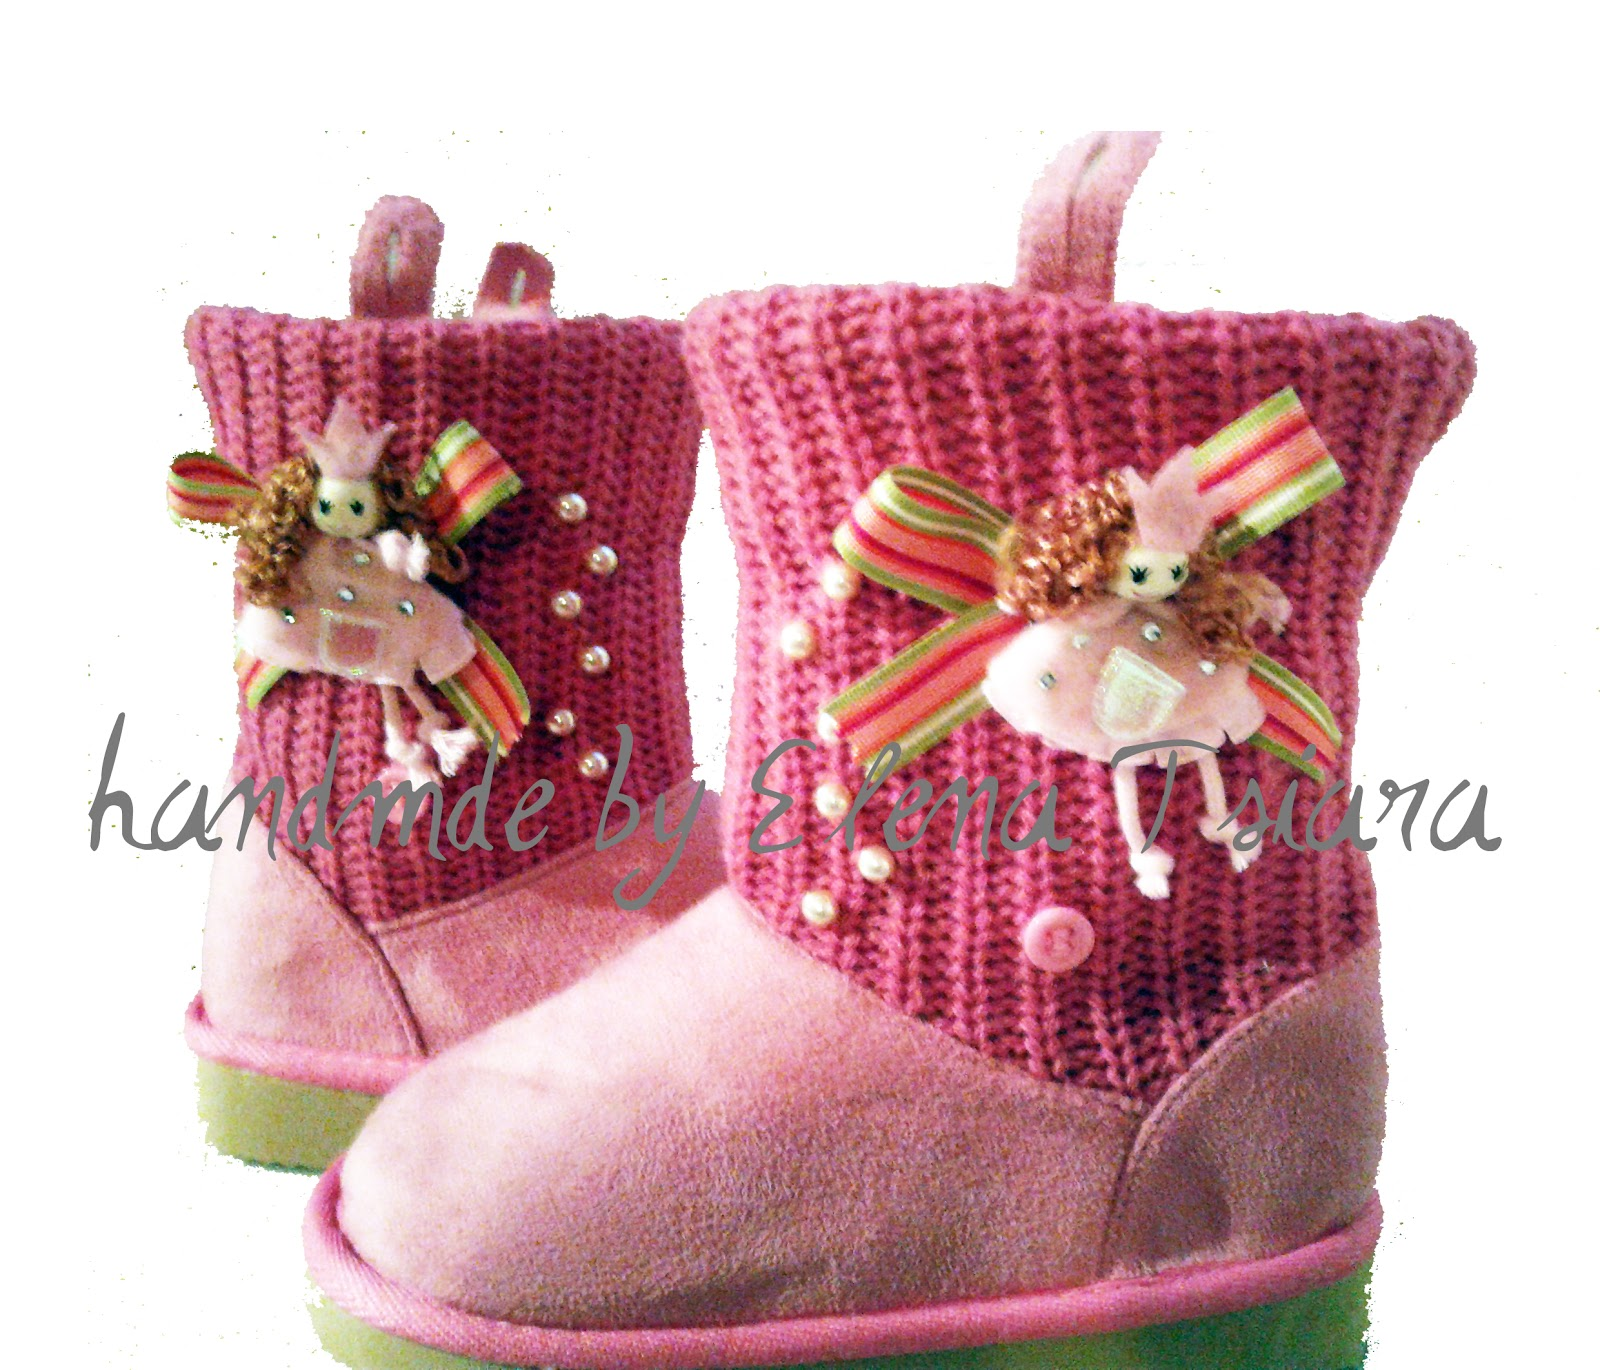 fbfa04f9cb elenas sandals  Παιδικές μπότες